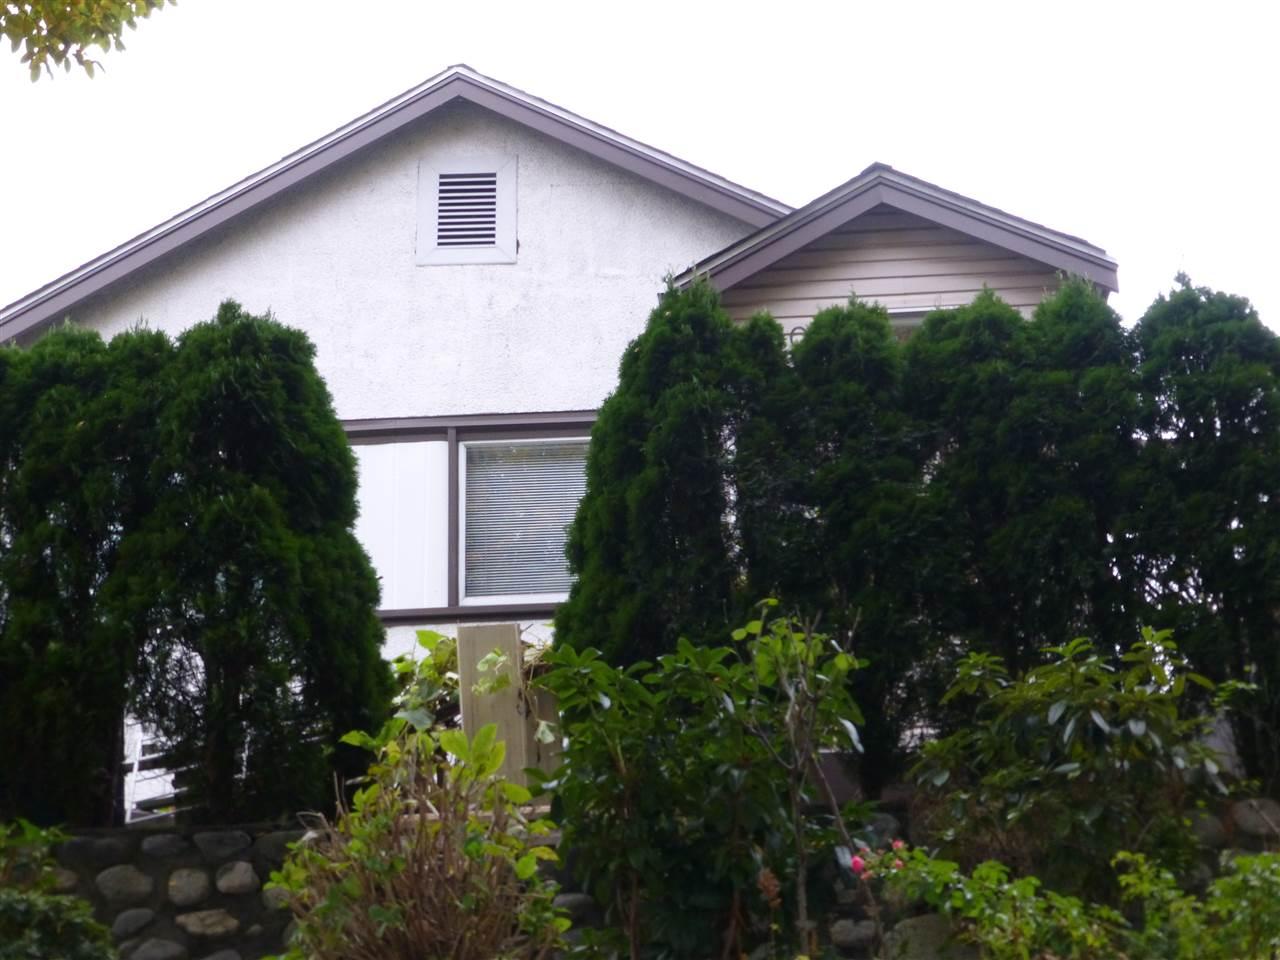 2707 E BROADWAY, Vancouver, BC V5M 1Y7